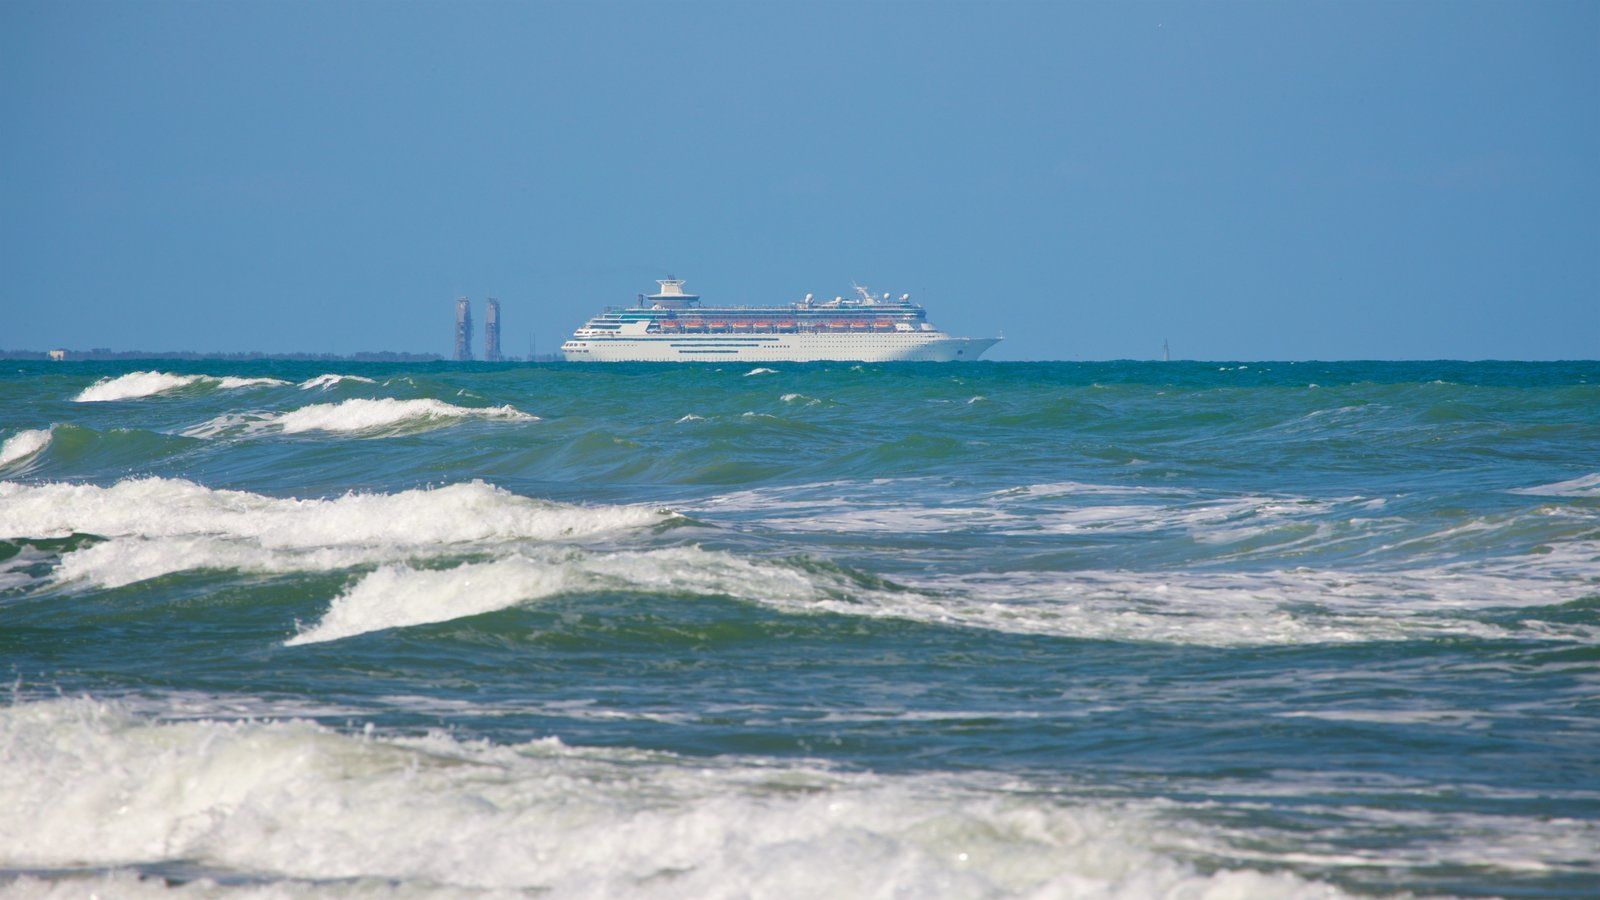 Cocoa Beach featuring general coastal views, cruising and waves